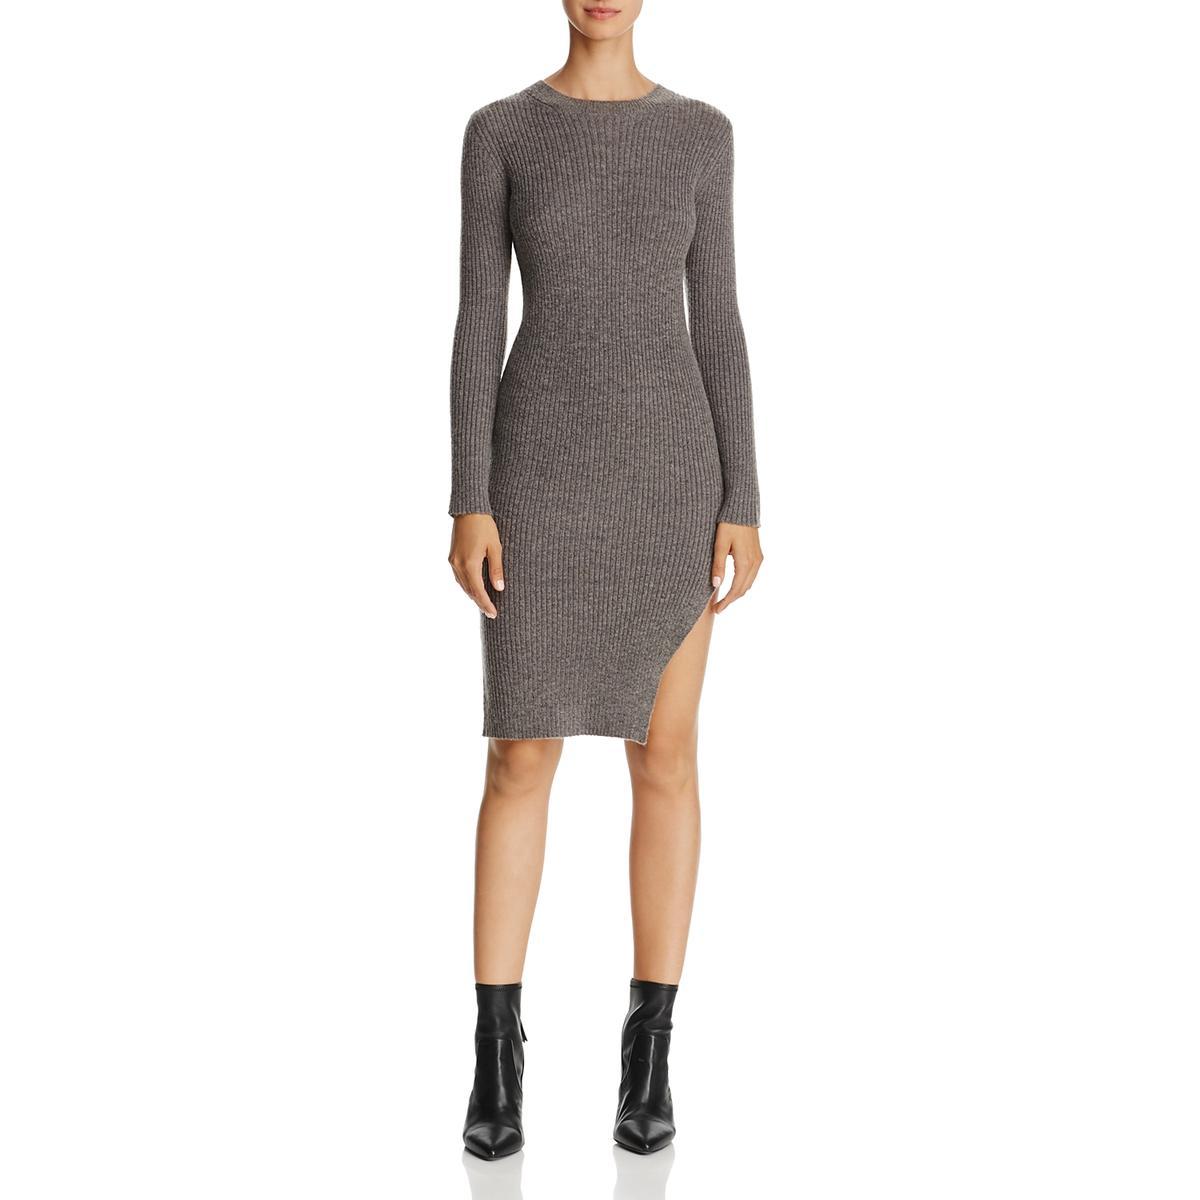 d74c7514513f Details about Freeway Womens Gray Wool Blend Knee-Length Side Slit  Sweaterdress L BHFO 7266